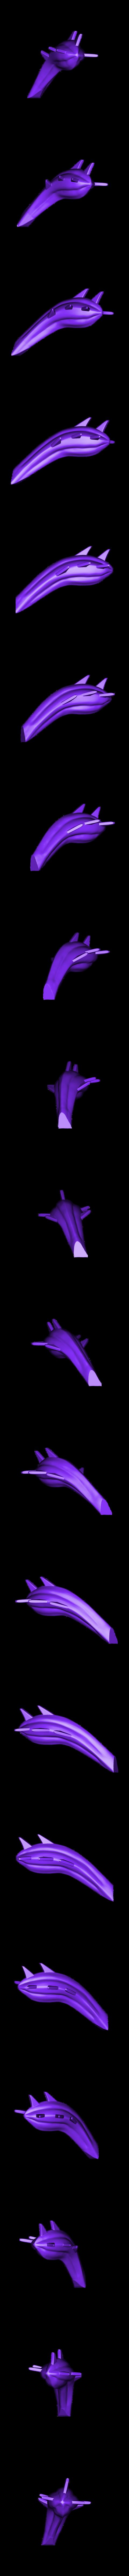 Christmas_Tree_Cactus_Arm_2_1.stl Download free STL file Christmas Cactus • 3D print design, Nairobiguy3D